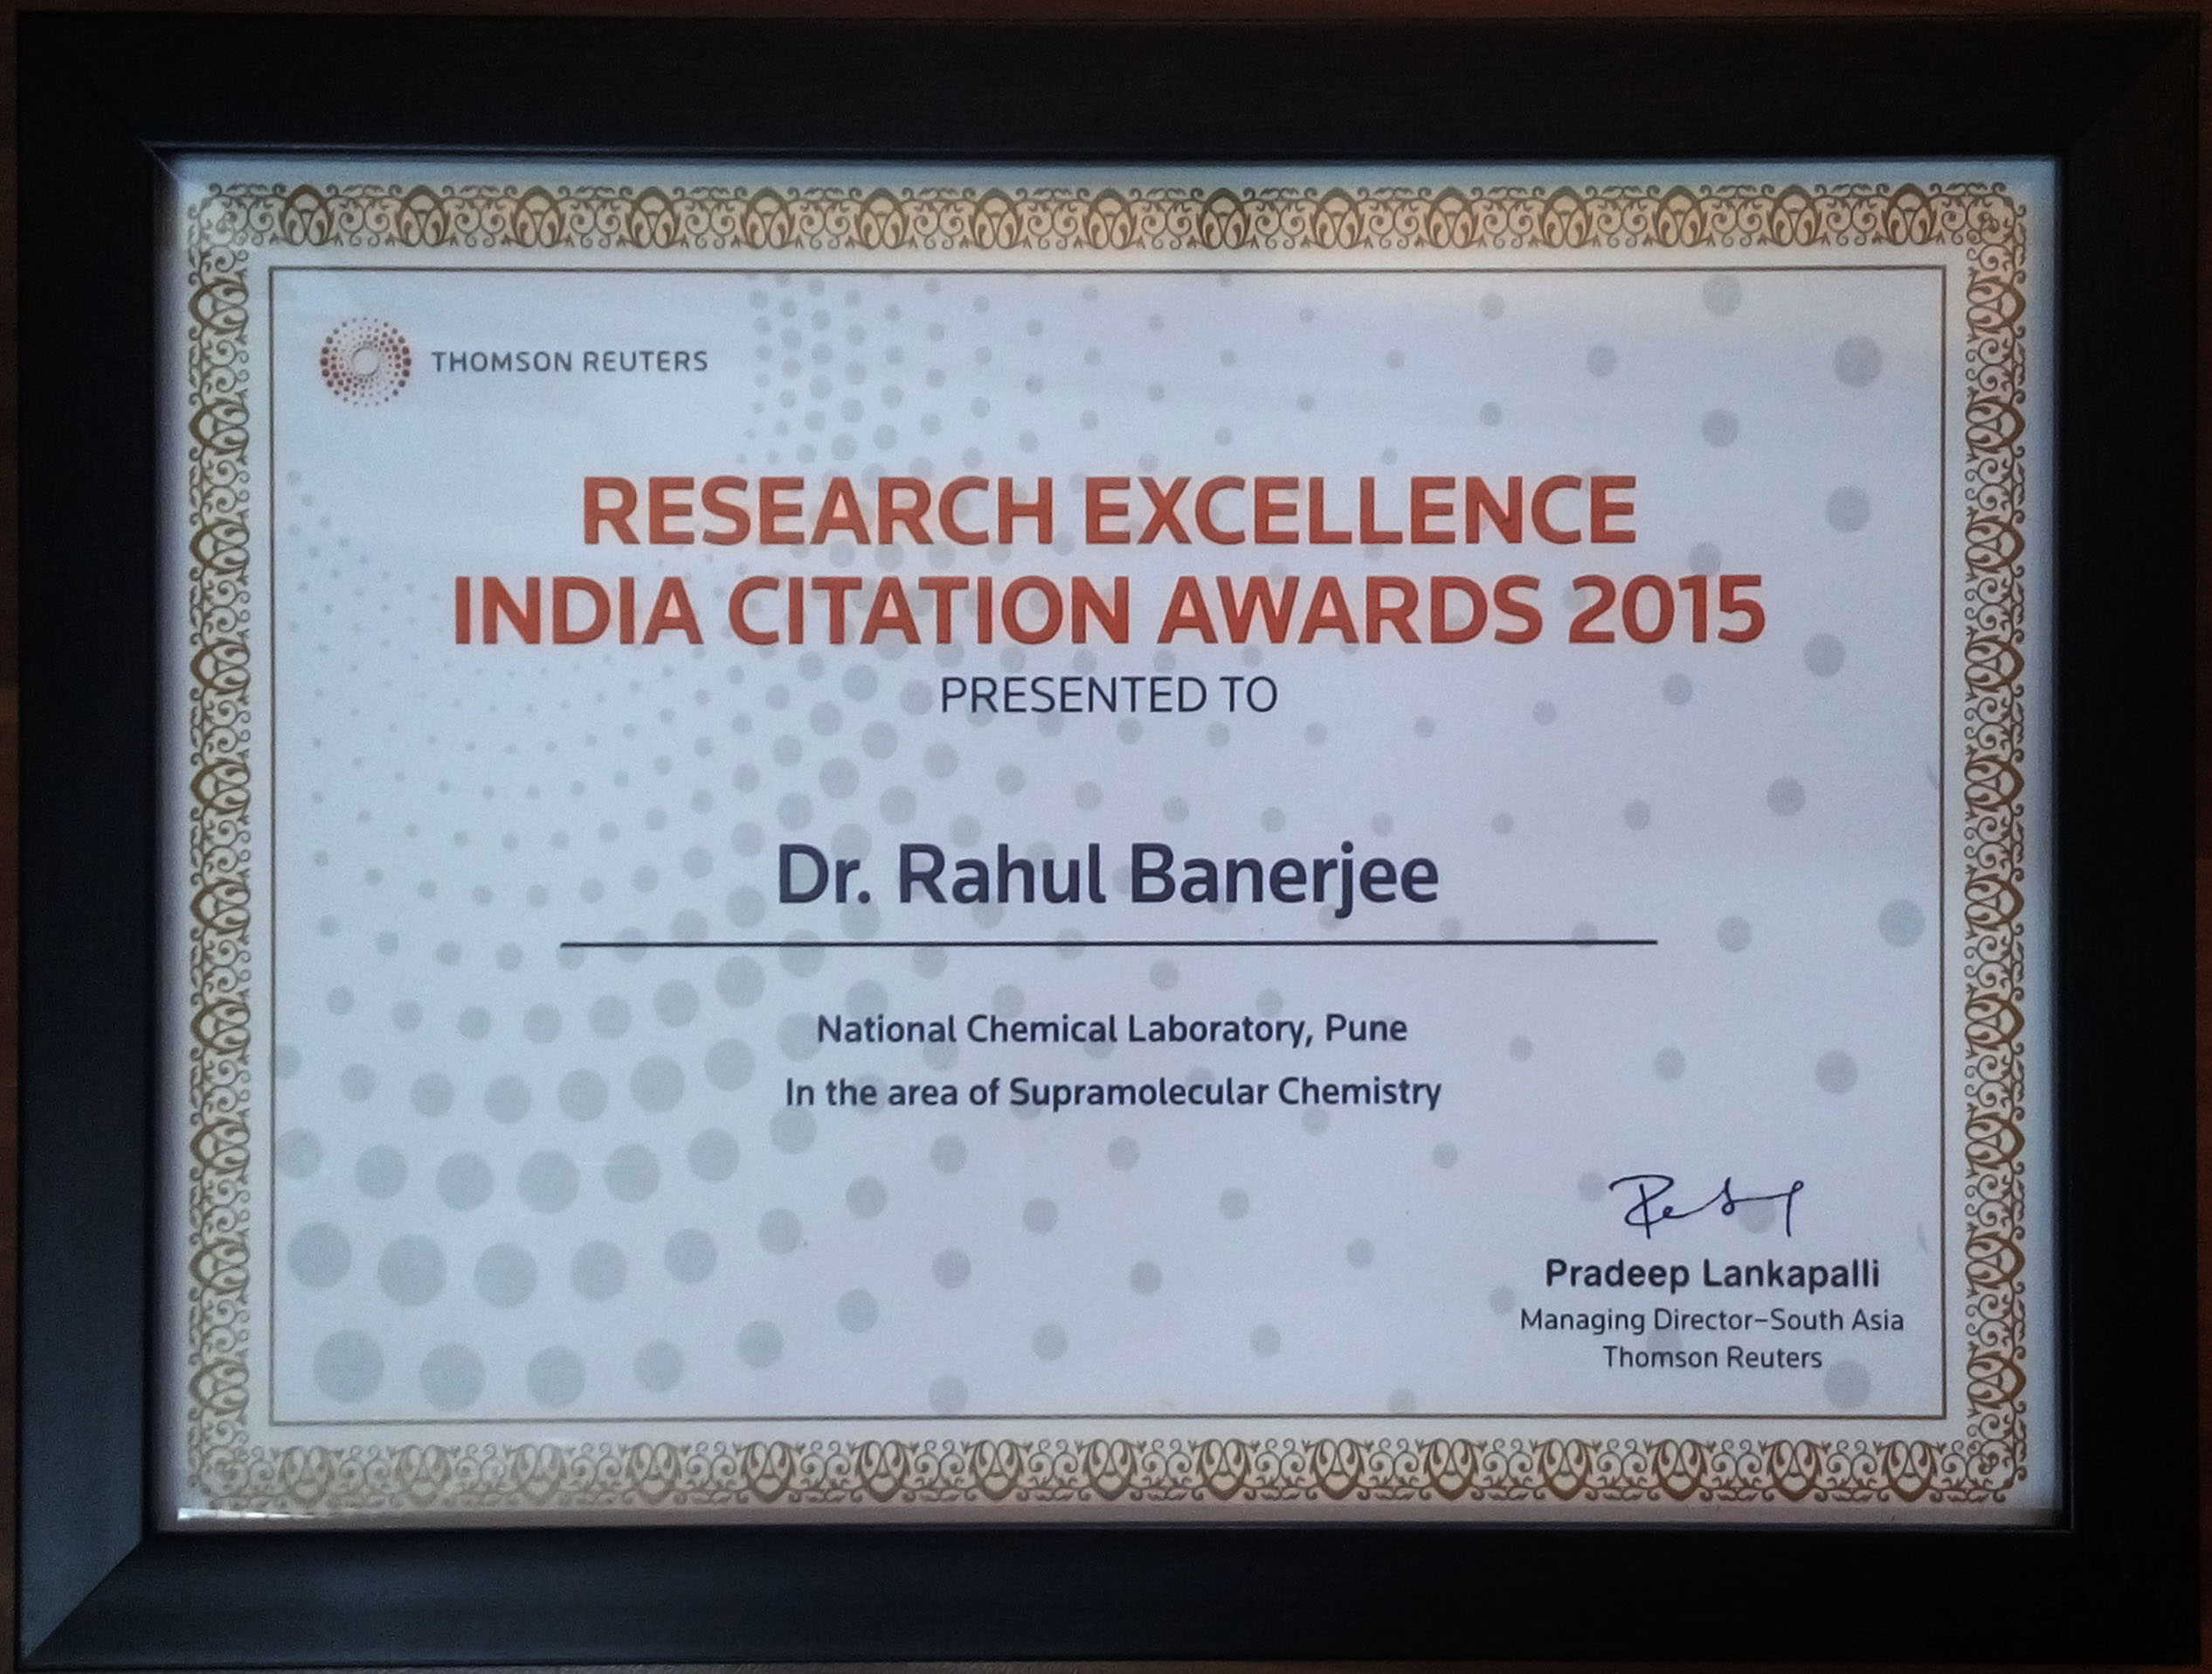 Professor Banerjee's Award